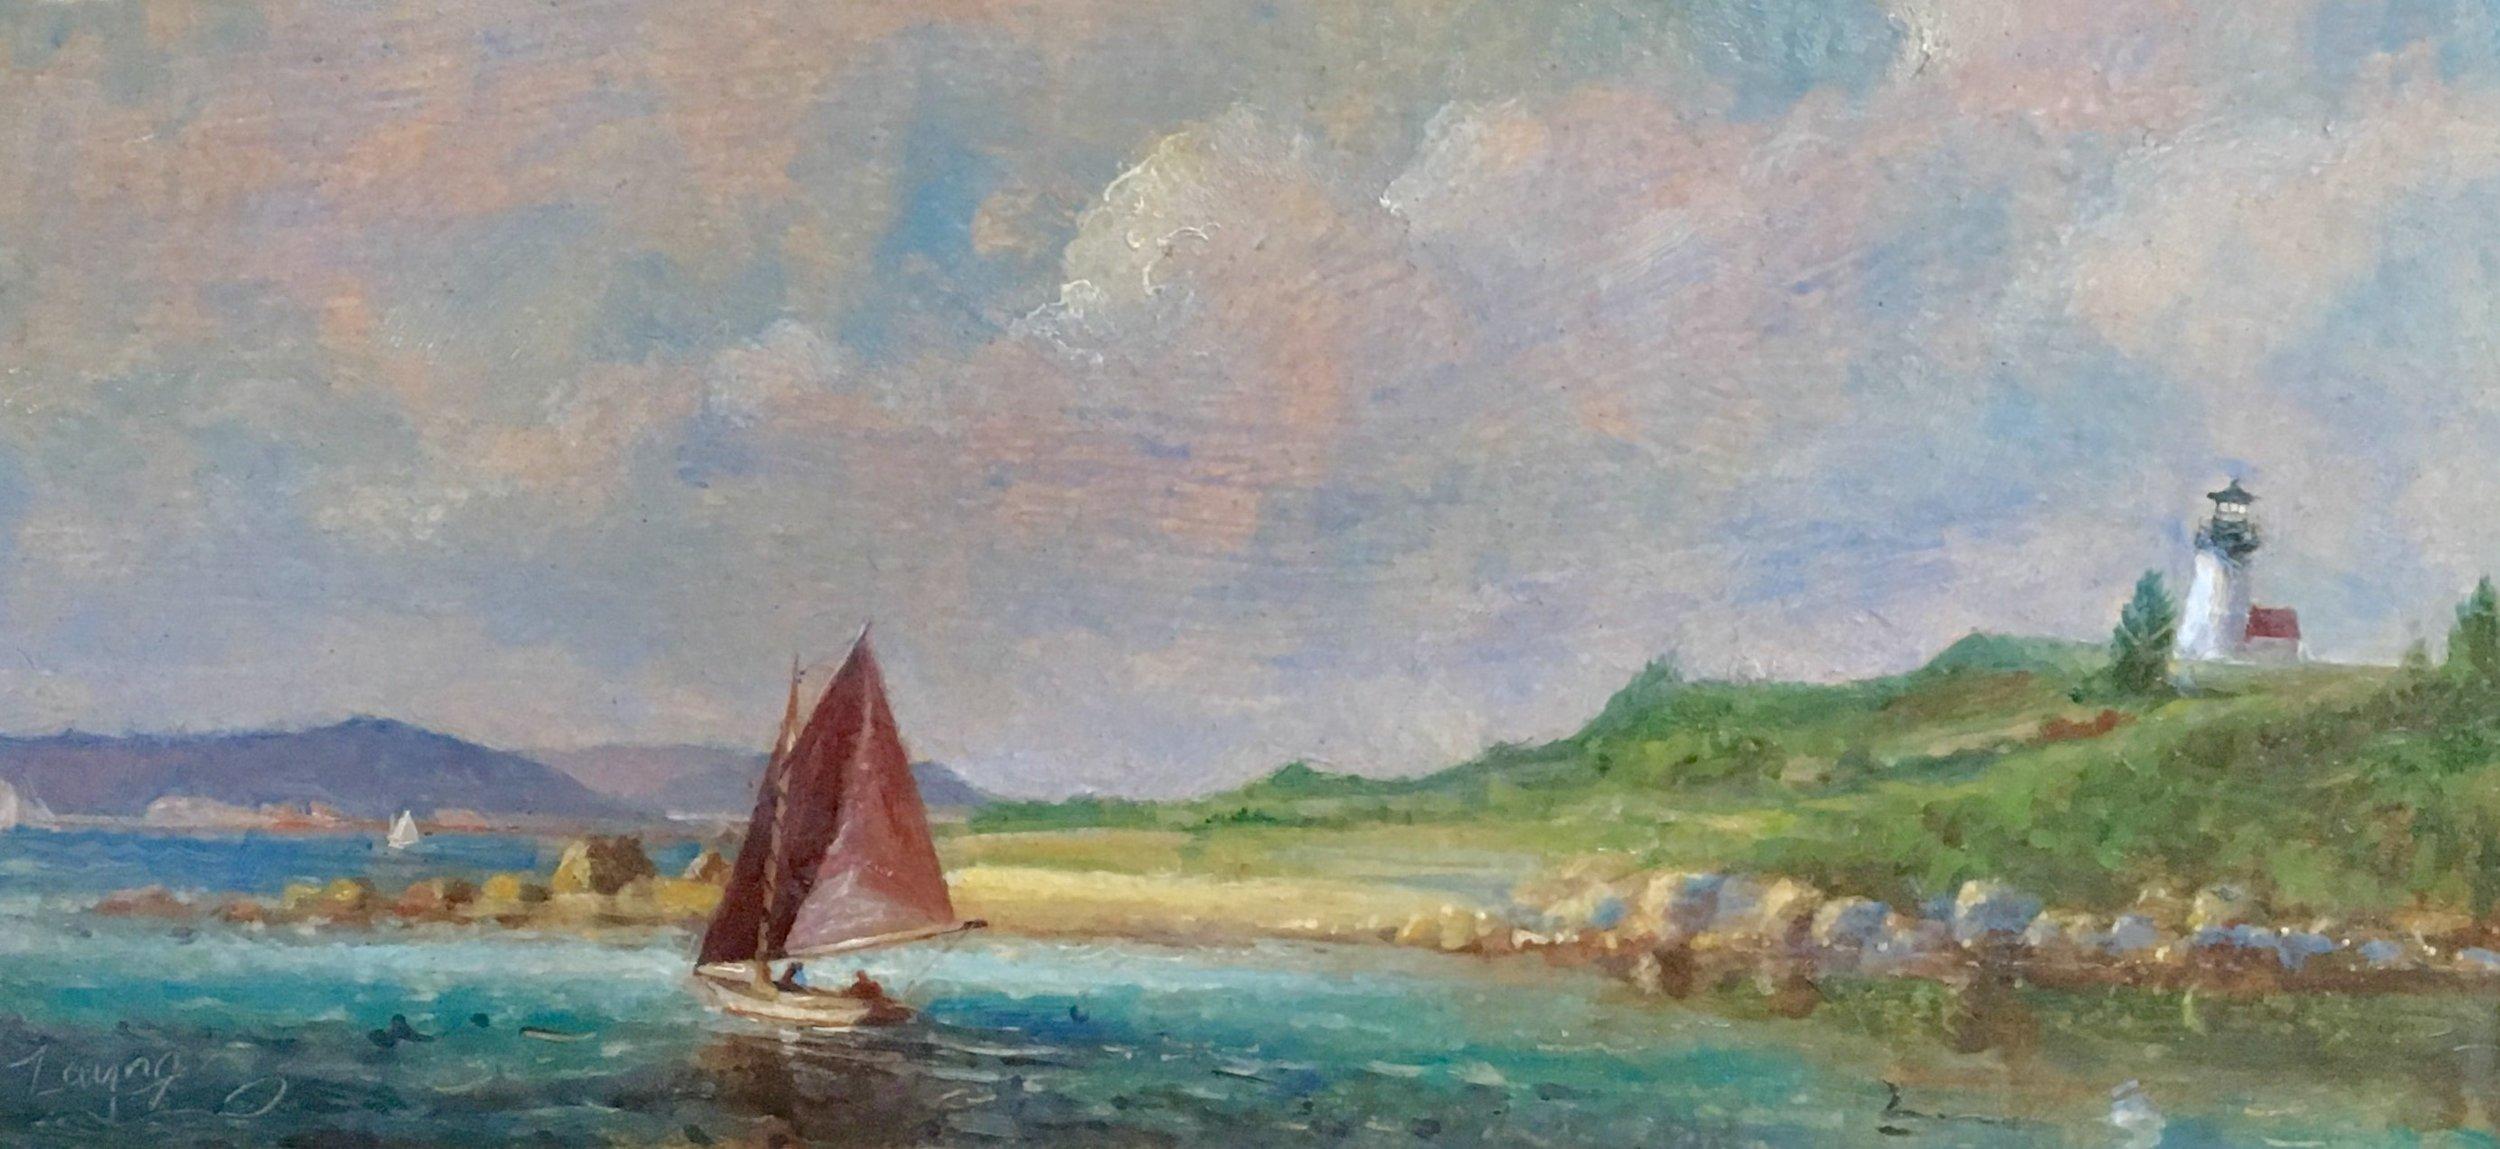 PETER ARGUIMBAU    Herreshoff, Tarpaulin Cove, MA    A Herreshoff with tanbark sails passes by Tarpaulin Cove Lighthouse, built in 1891, on the quaint Naushon Island.  8 x 16 inches